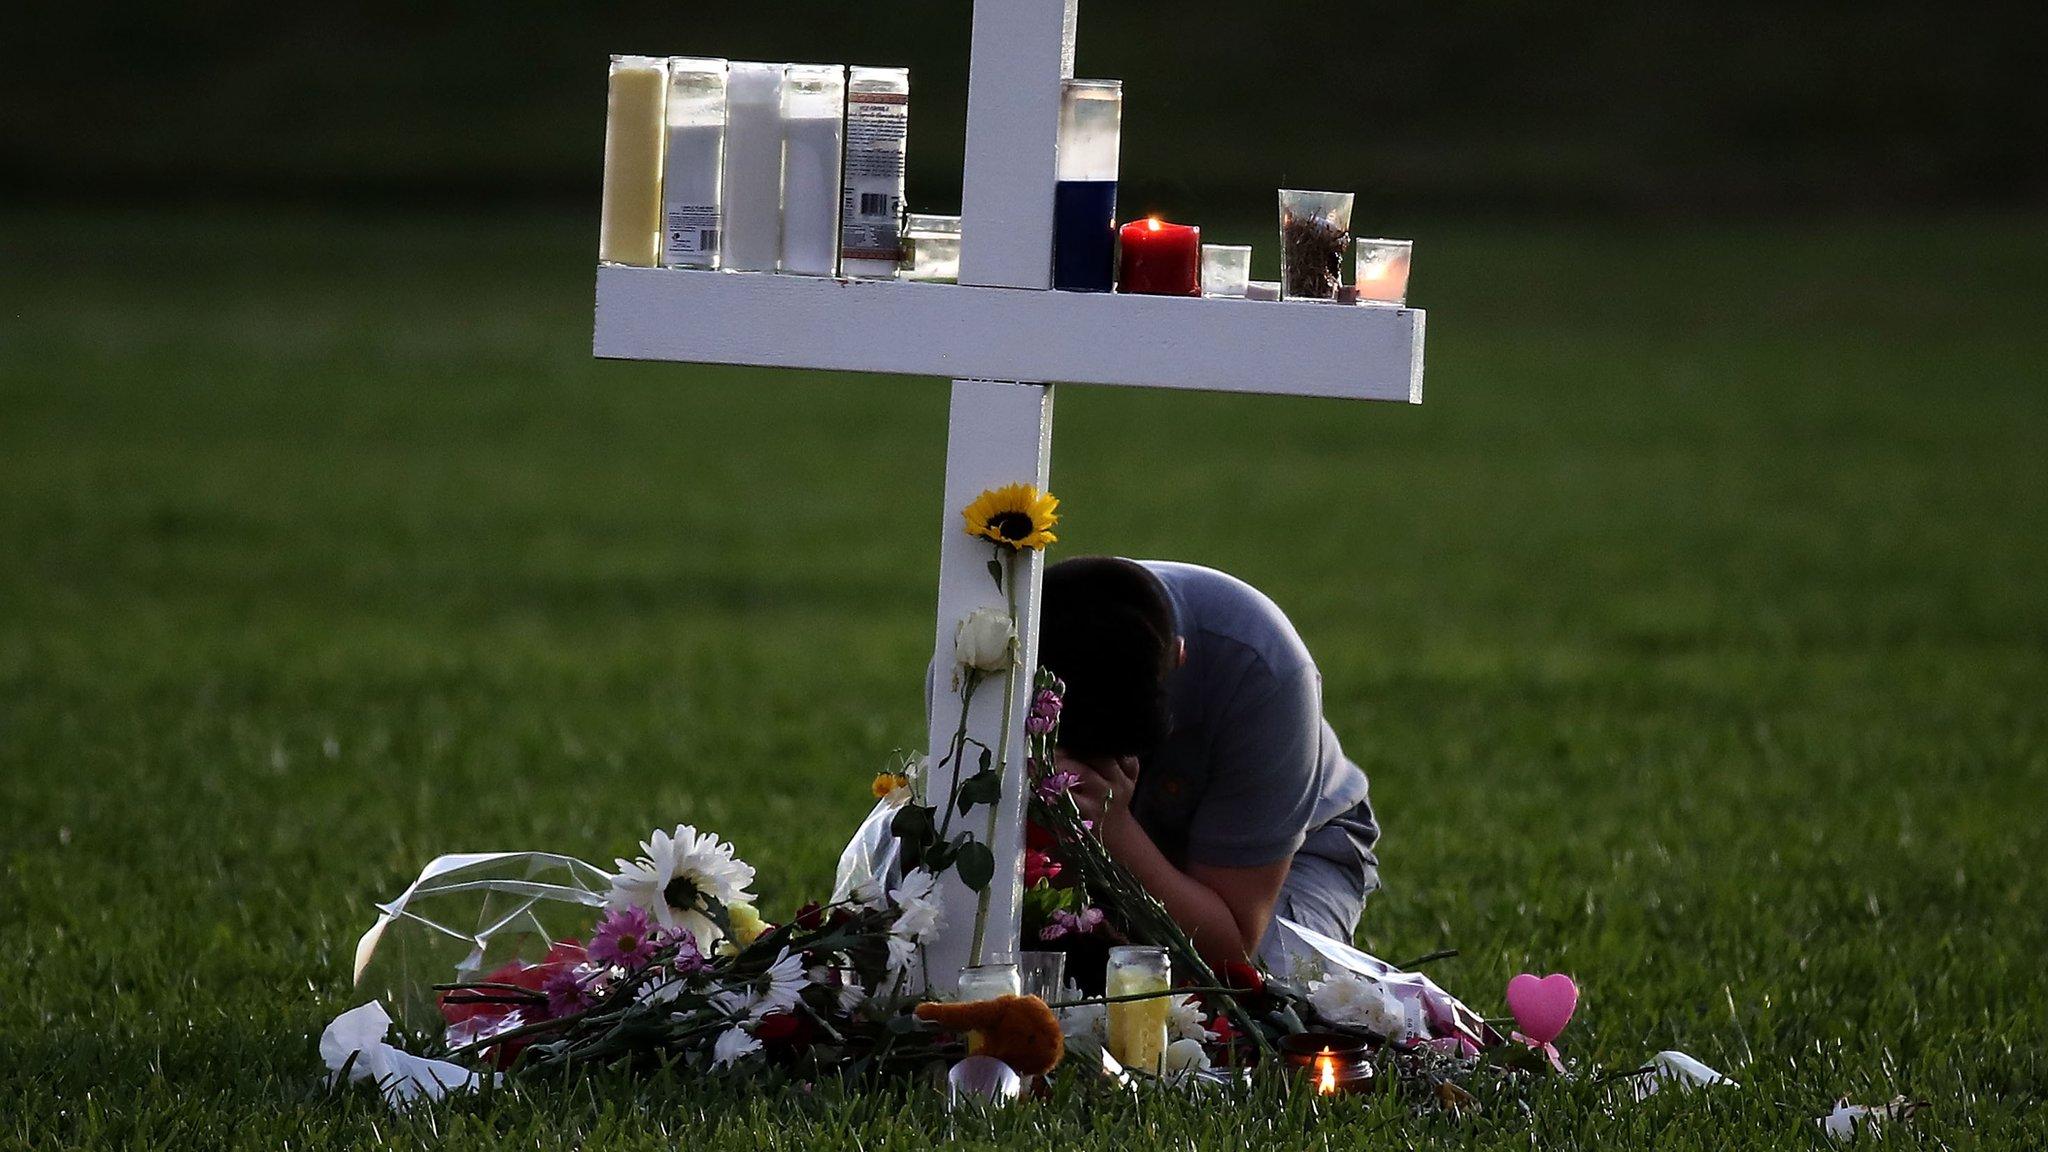 Florida school shooting: FBI under pressure over failure to act